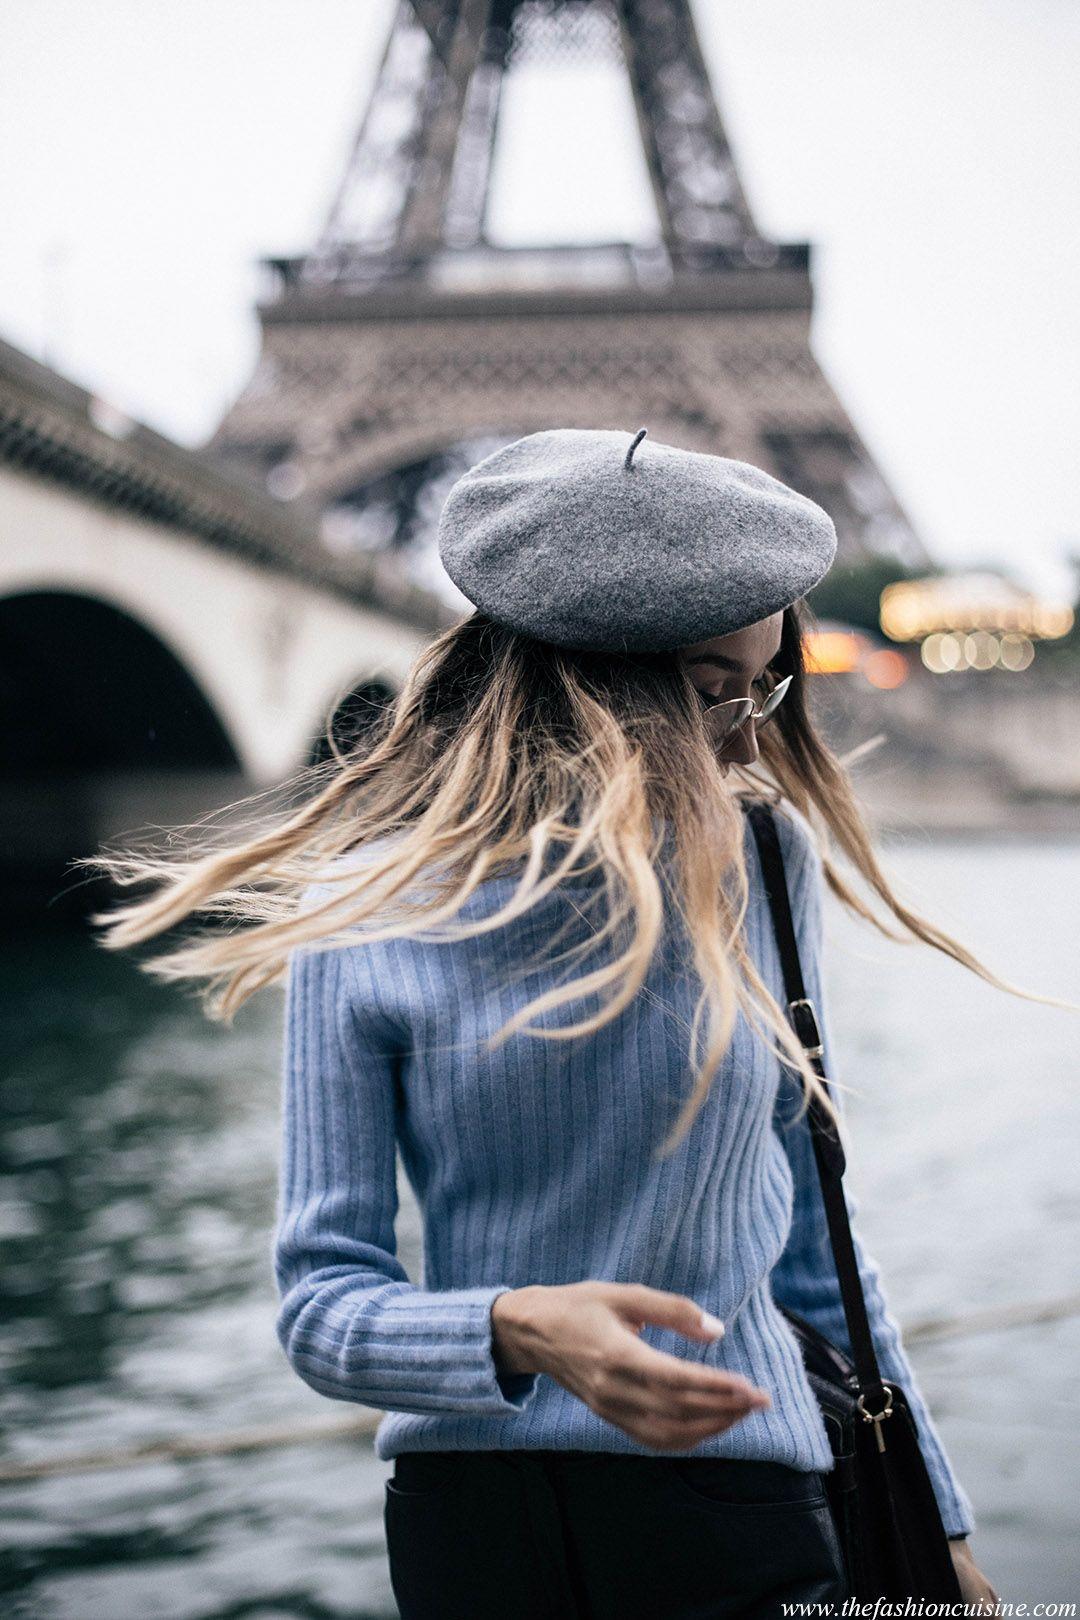 50031b85e6f2fd Tumblr photo fashion blogger Beatrice Gutu in Paris wearing a grey beret  near Eiffel Tower